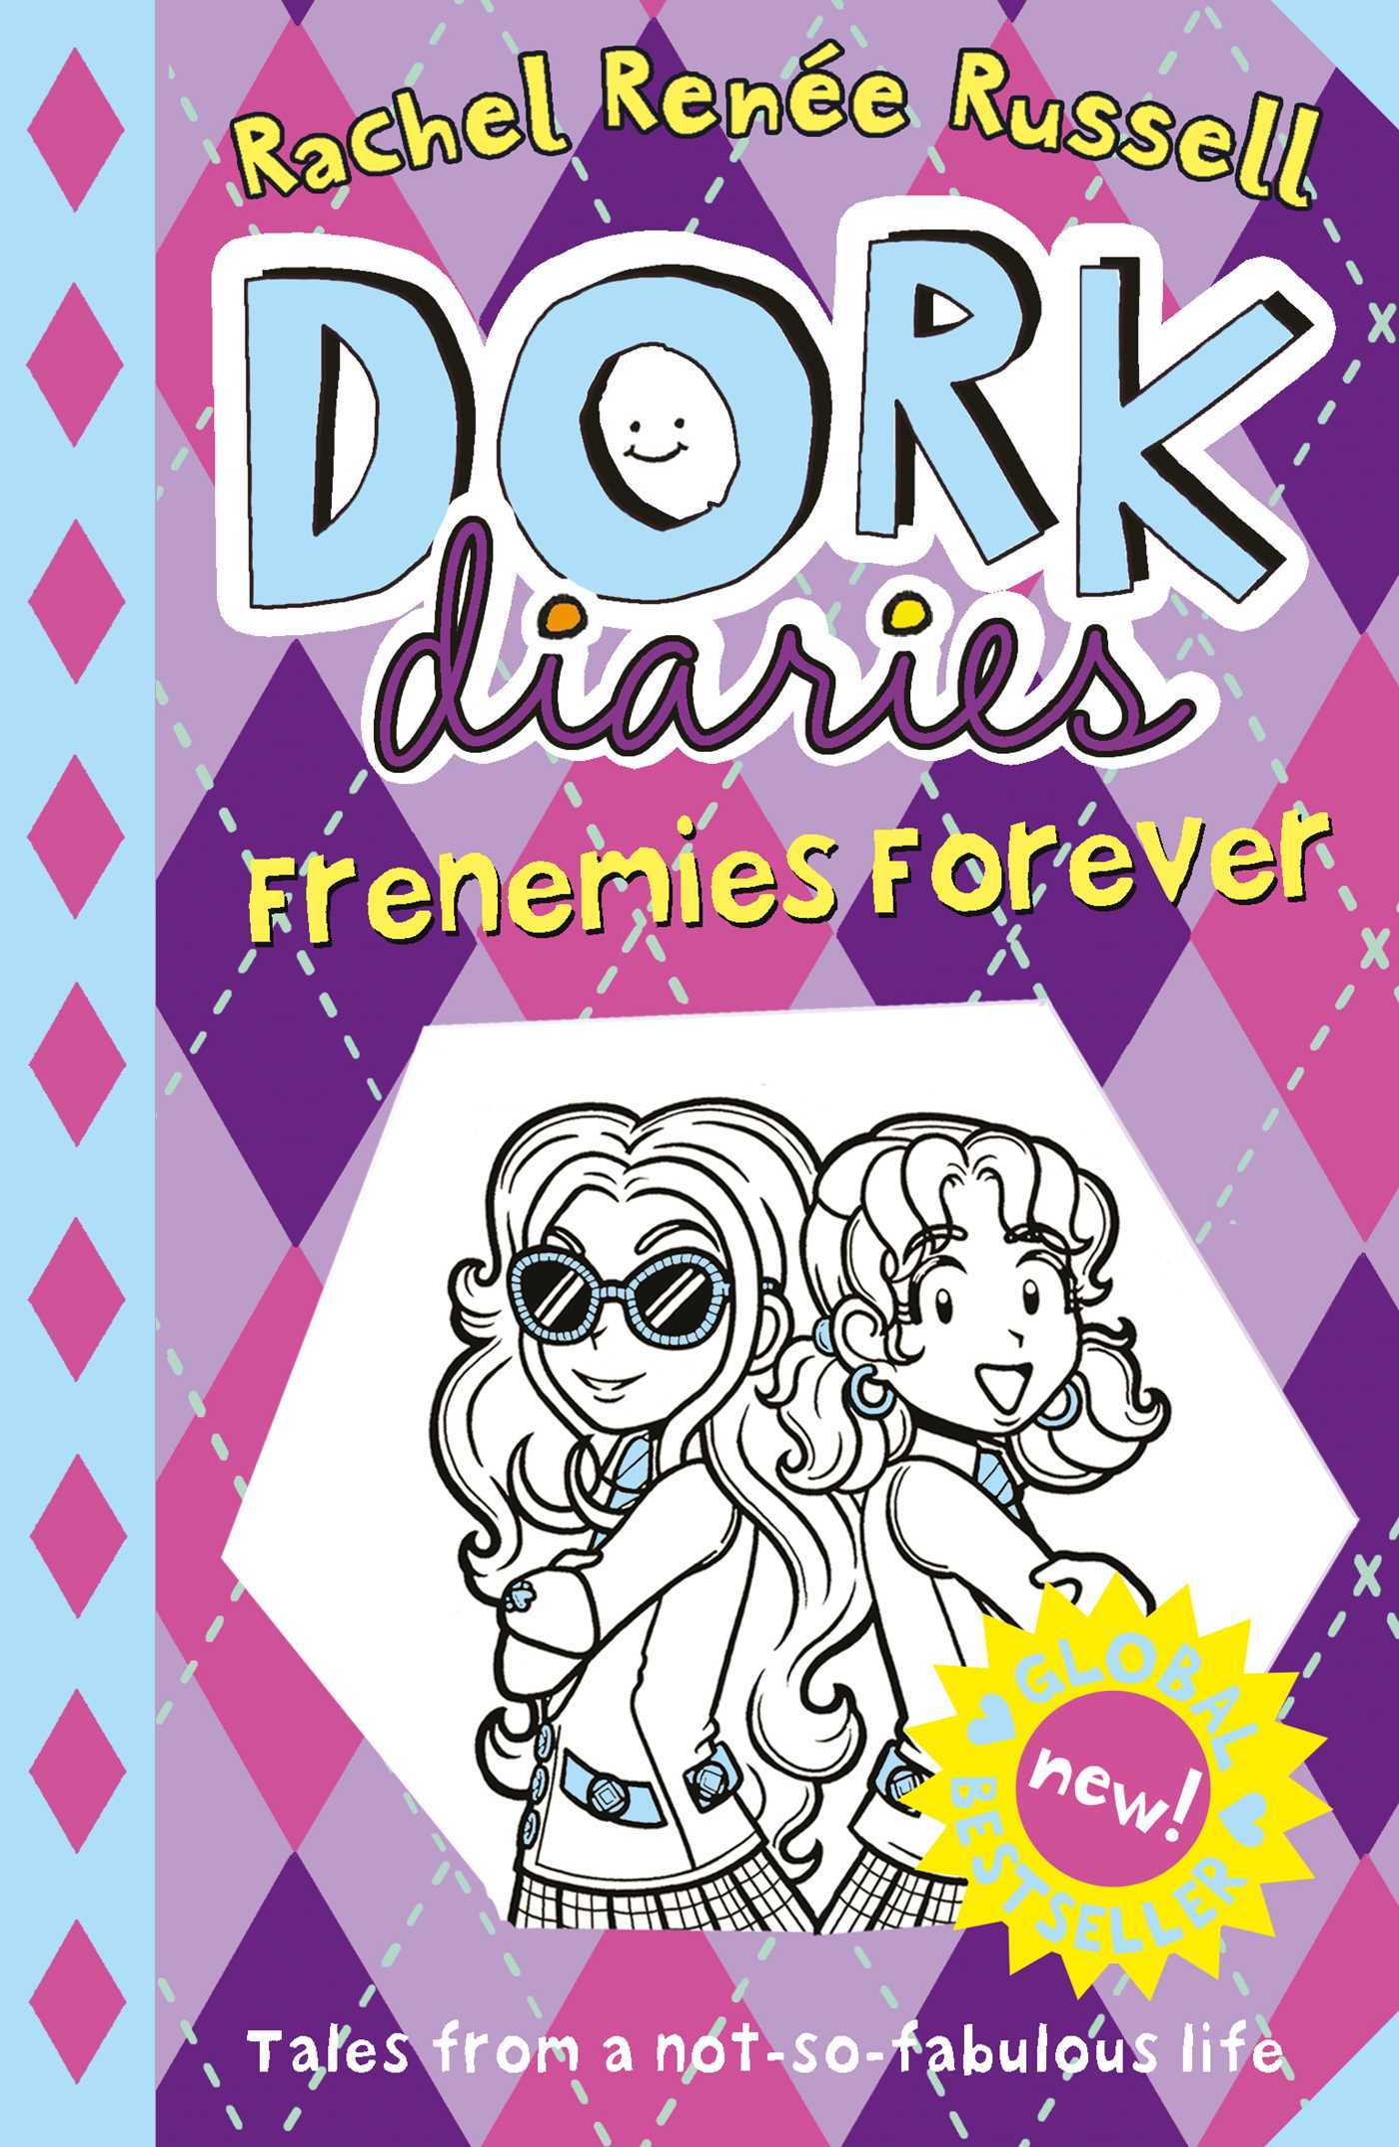 Dork diaries frenemies forever 9781471158025 hr